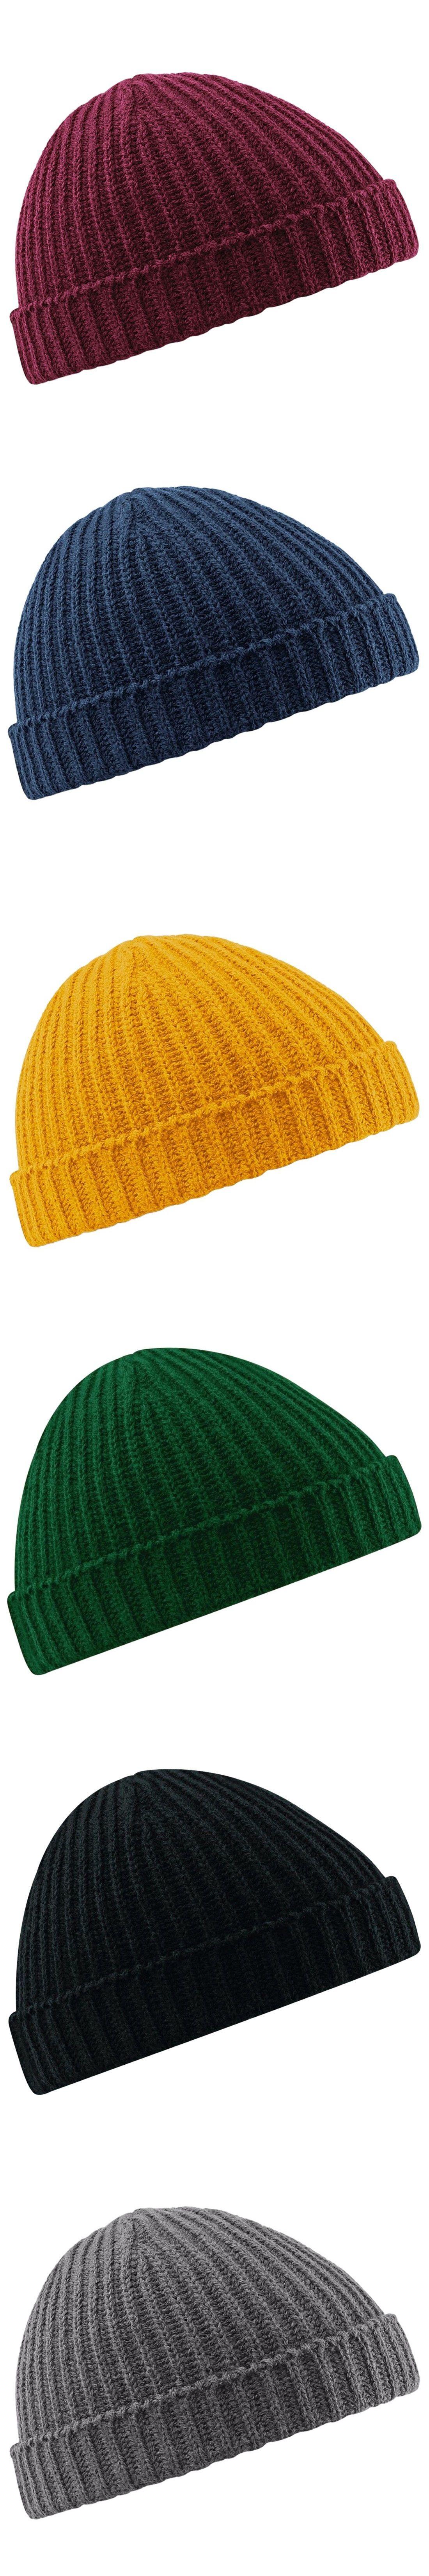 8c6d6272379 Fisherman Beanie Ribbed Hat Winter Warm Turn Up Retro Mens Womens Ladies  Hat Turn Up